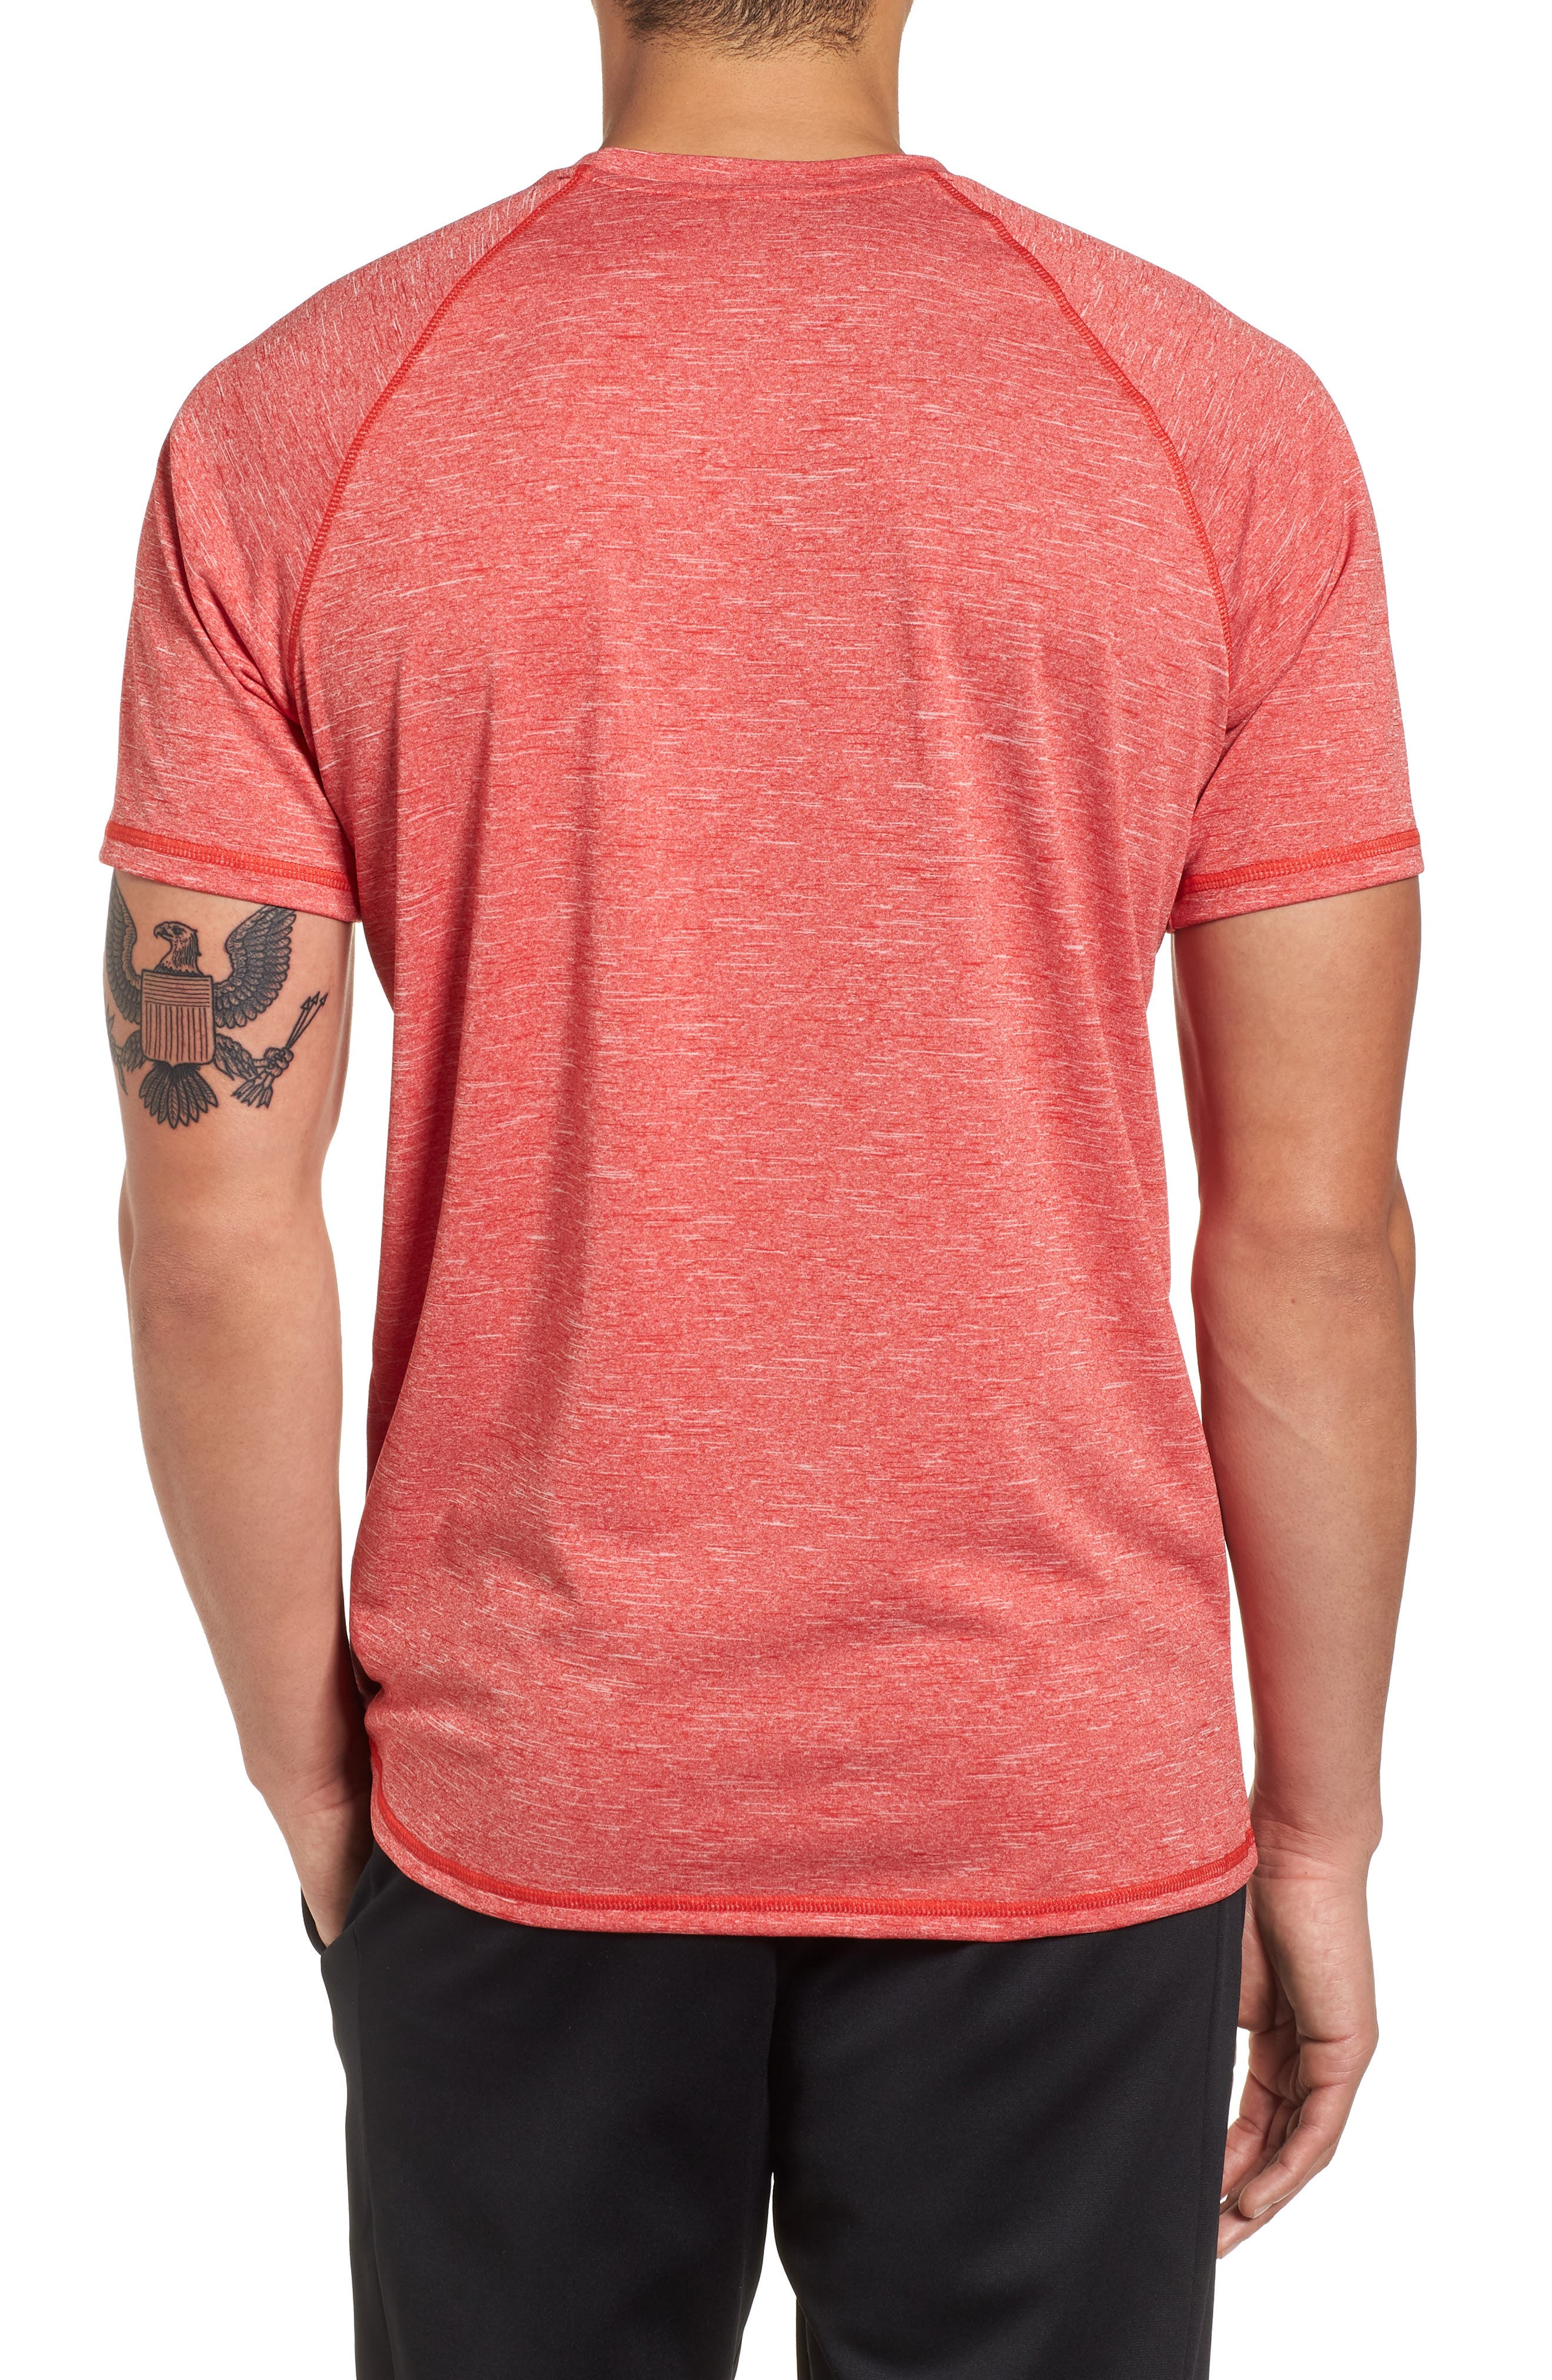 Dry Hydroguard T-Shirt,                             Alternate thumbnail 2, color,                             University Red